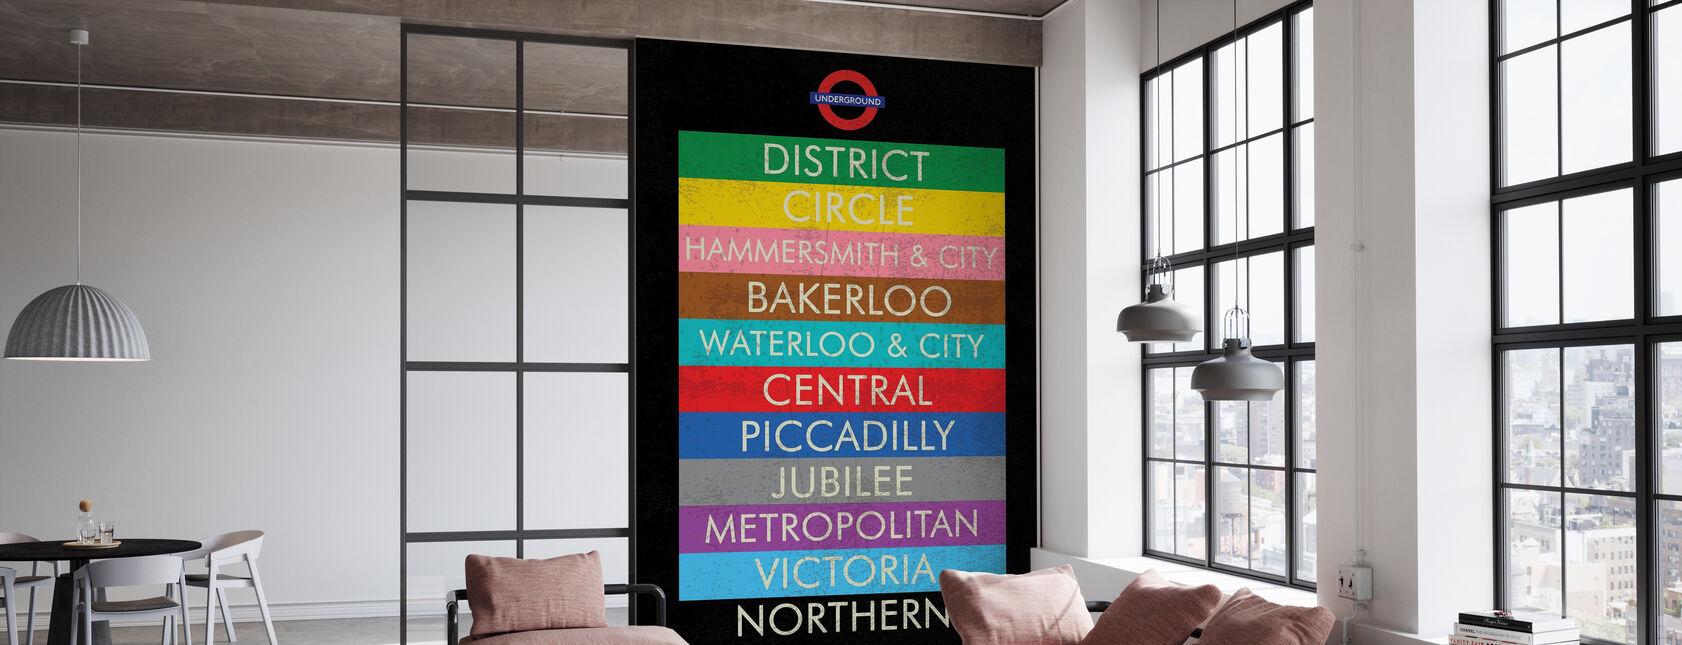 London Underground Sign - Wallpaper - Office